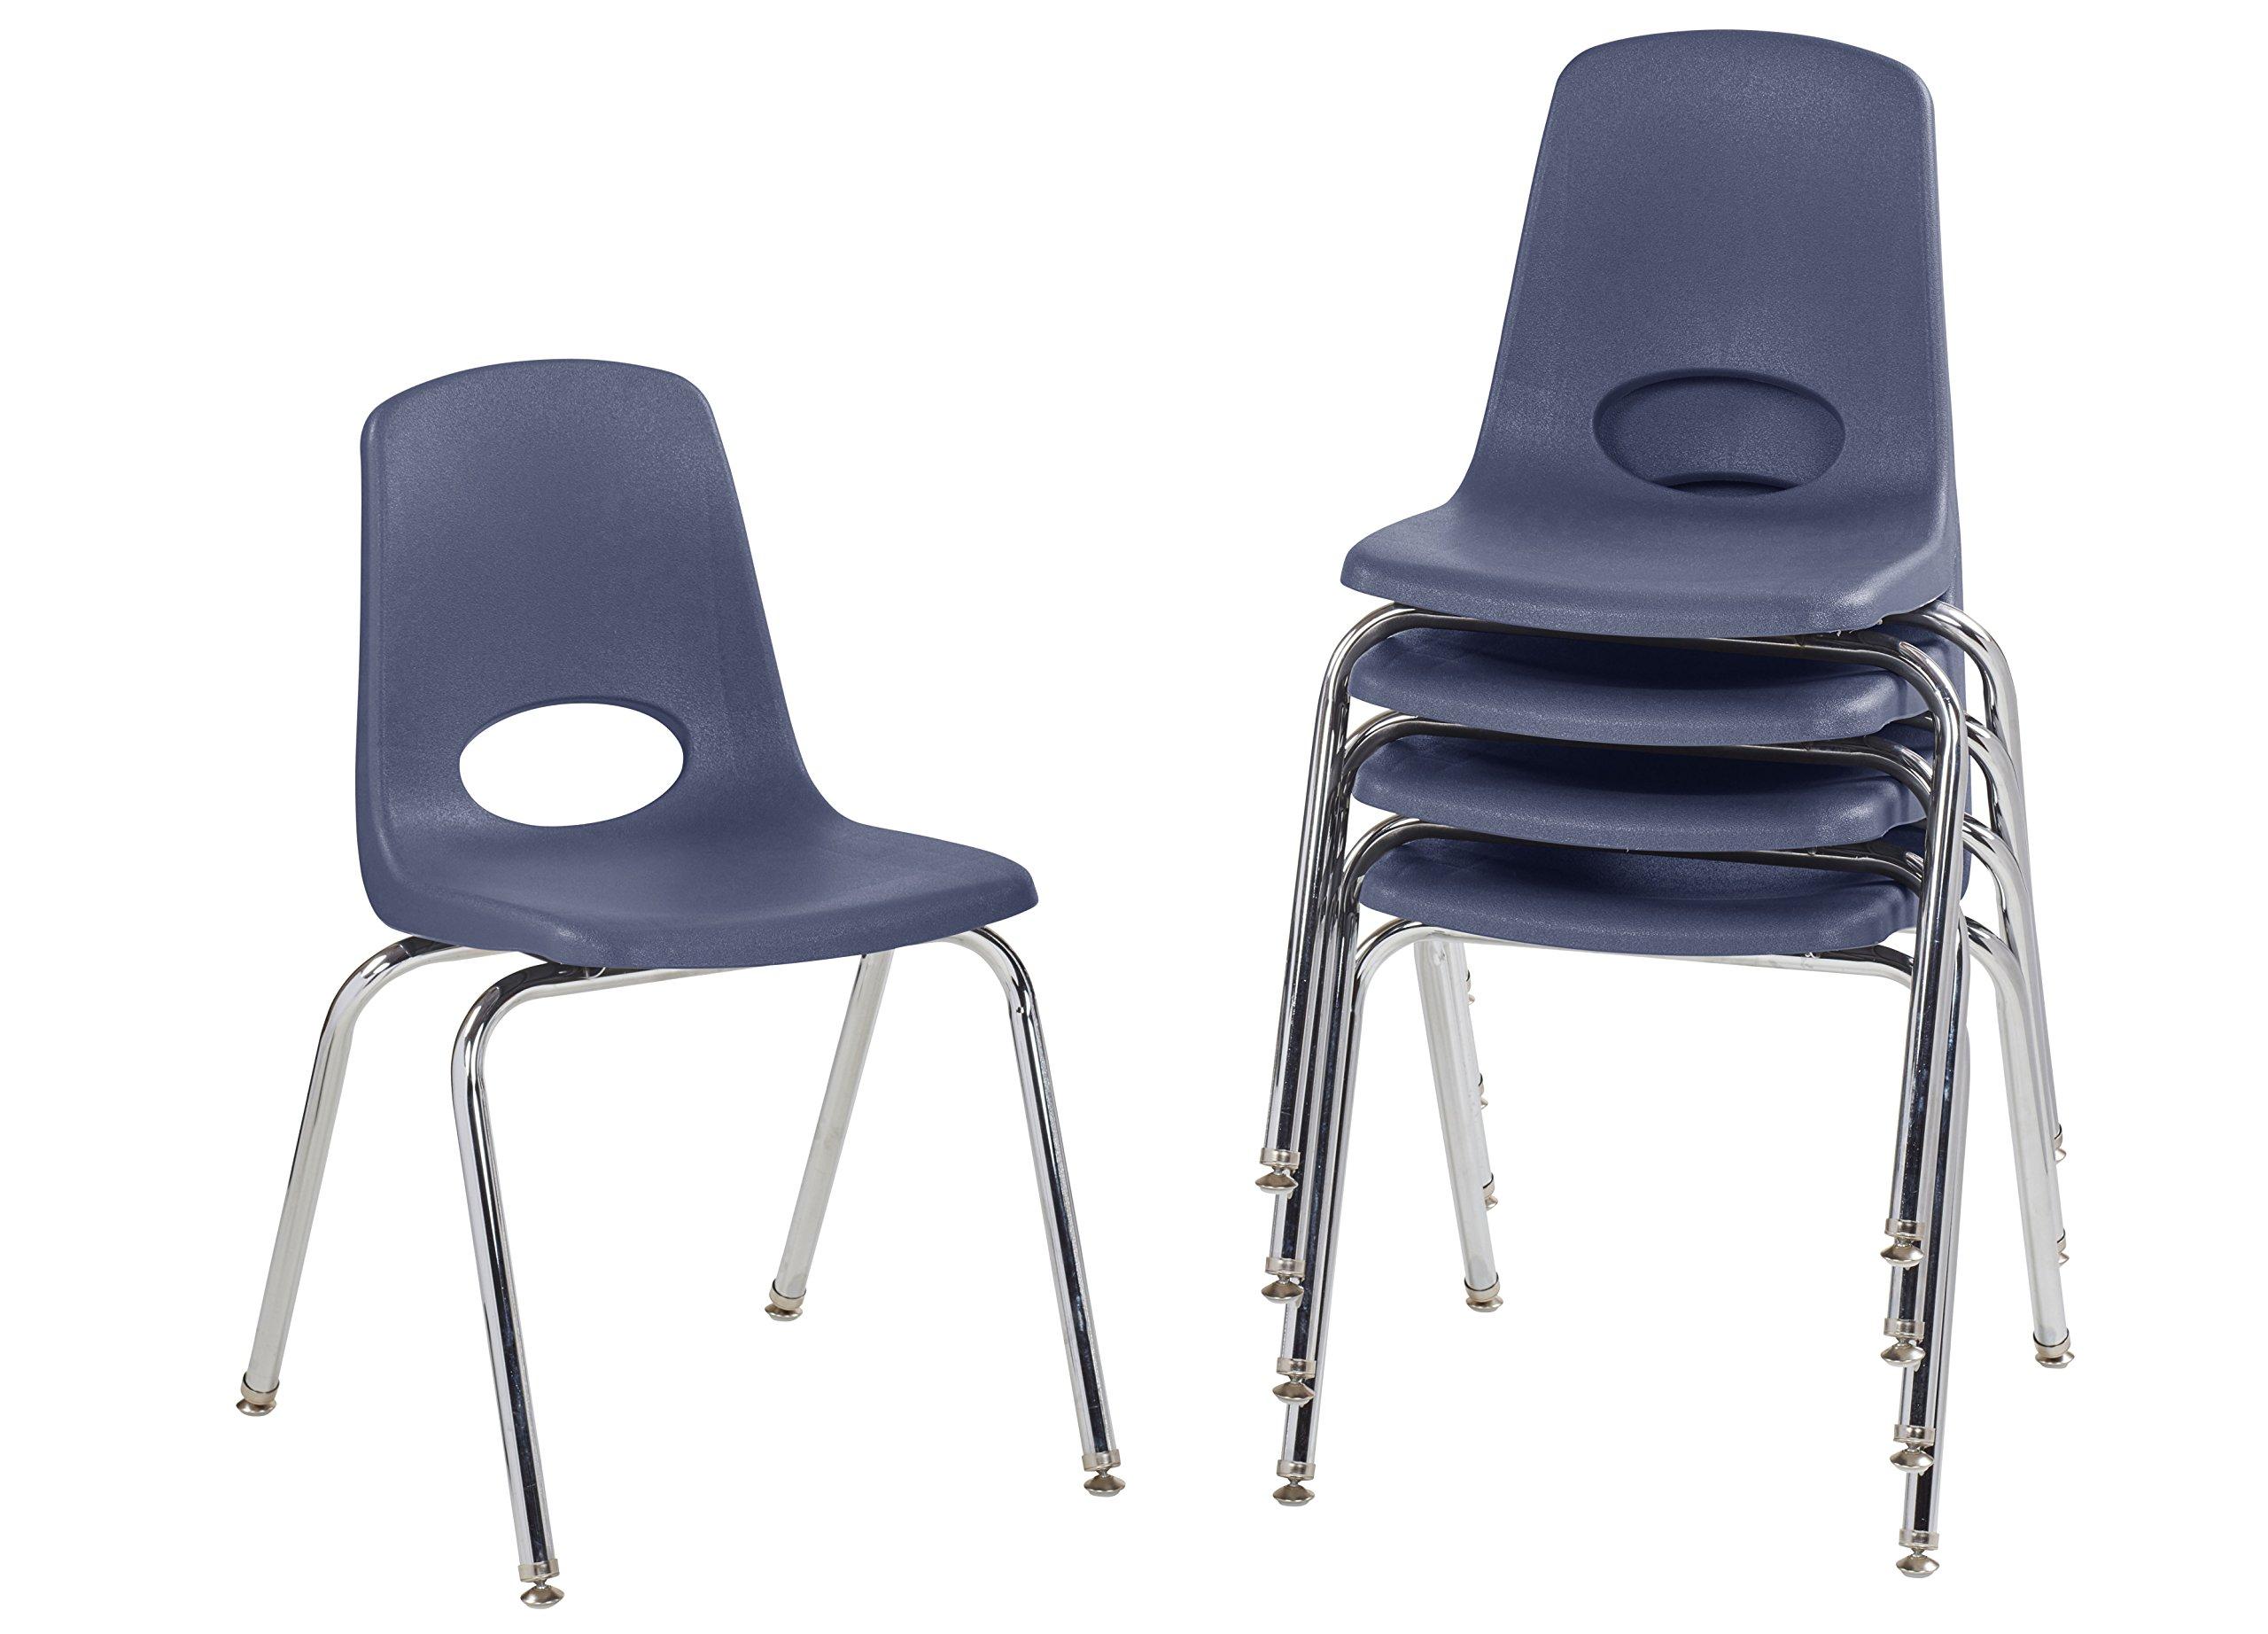 ECR4Kids 18'' School Stack Chair, Chrome Legs with Nylon Swivel Glides, Navy (5-Pack) by ECR4Kids (Image #7)